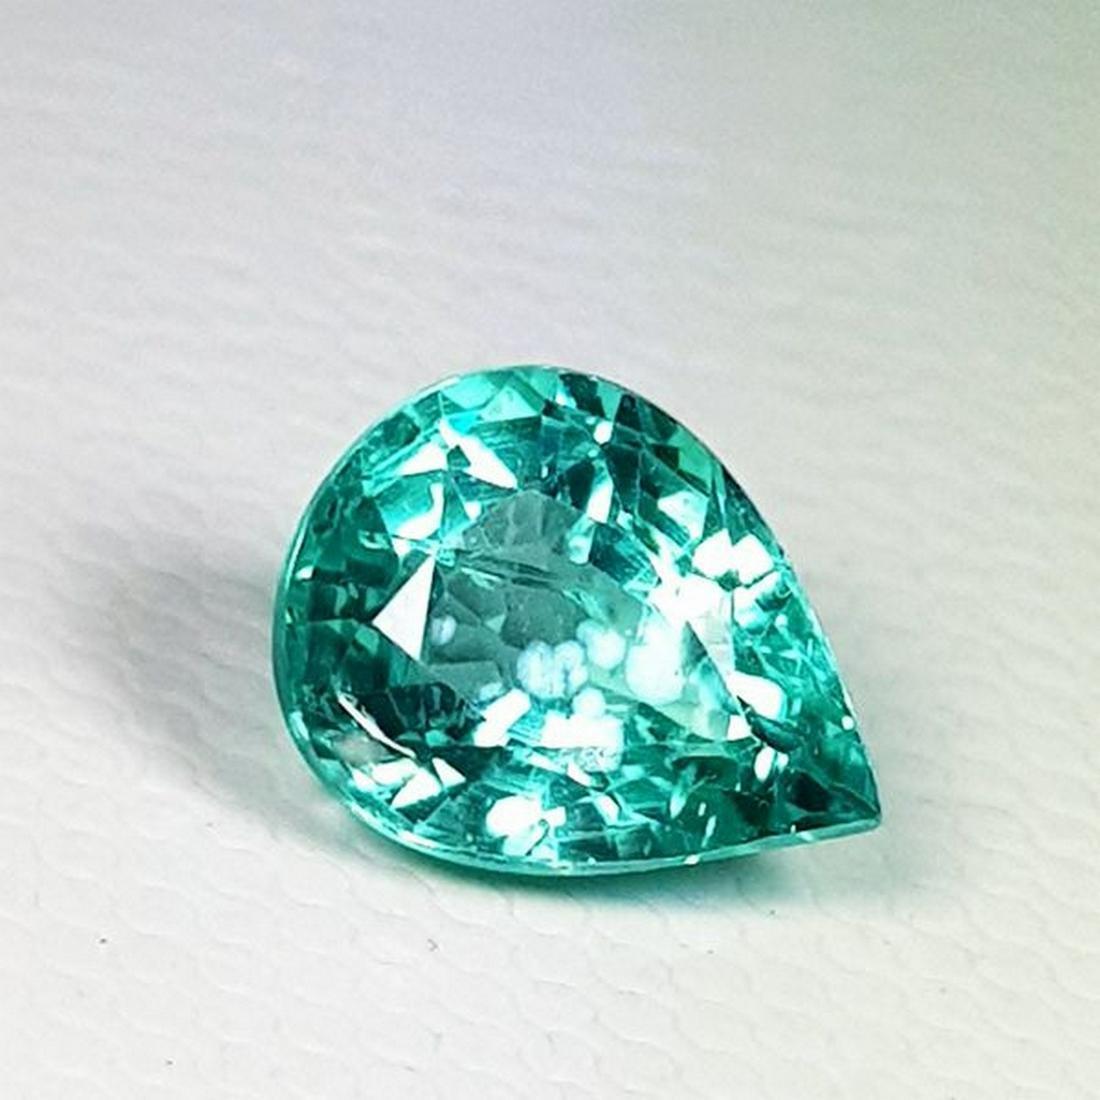 2.13 ct Natural Green Apatite